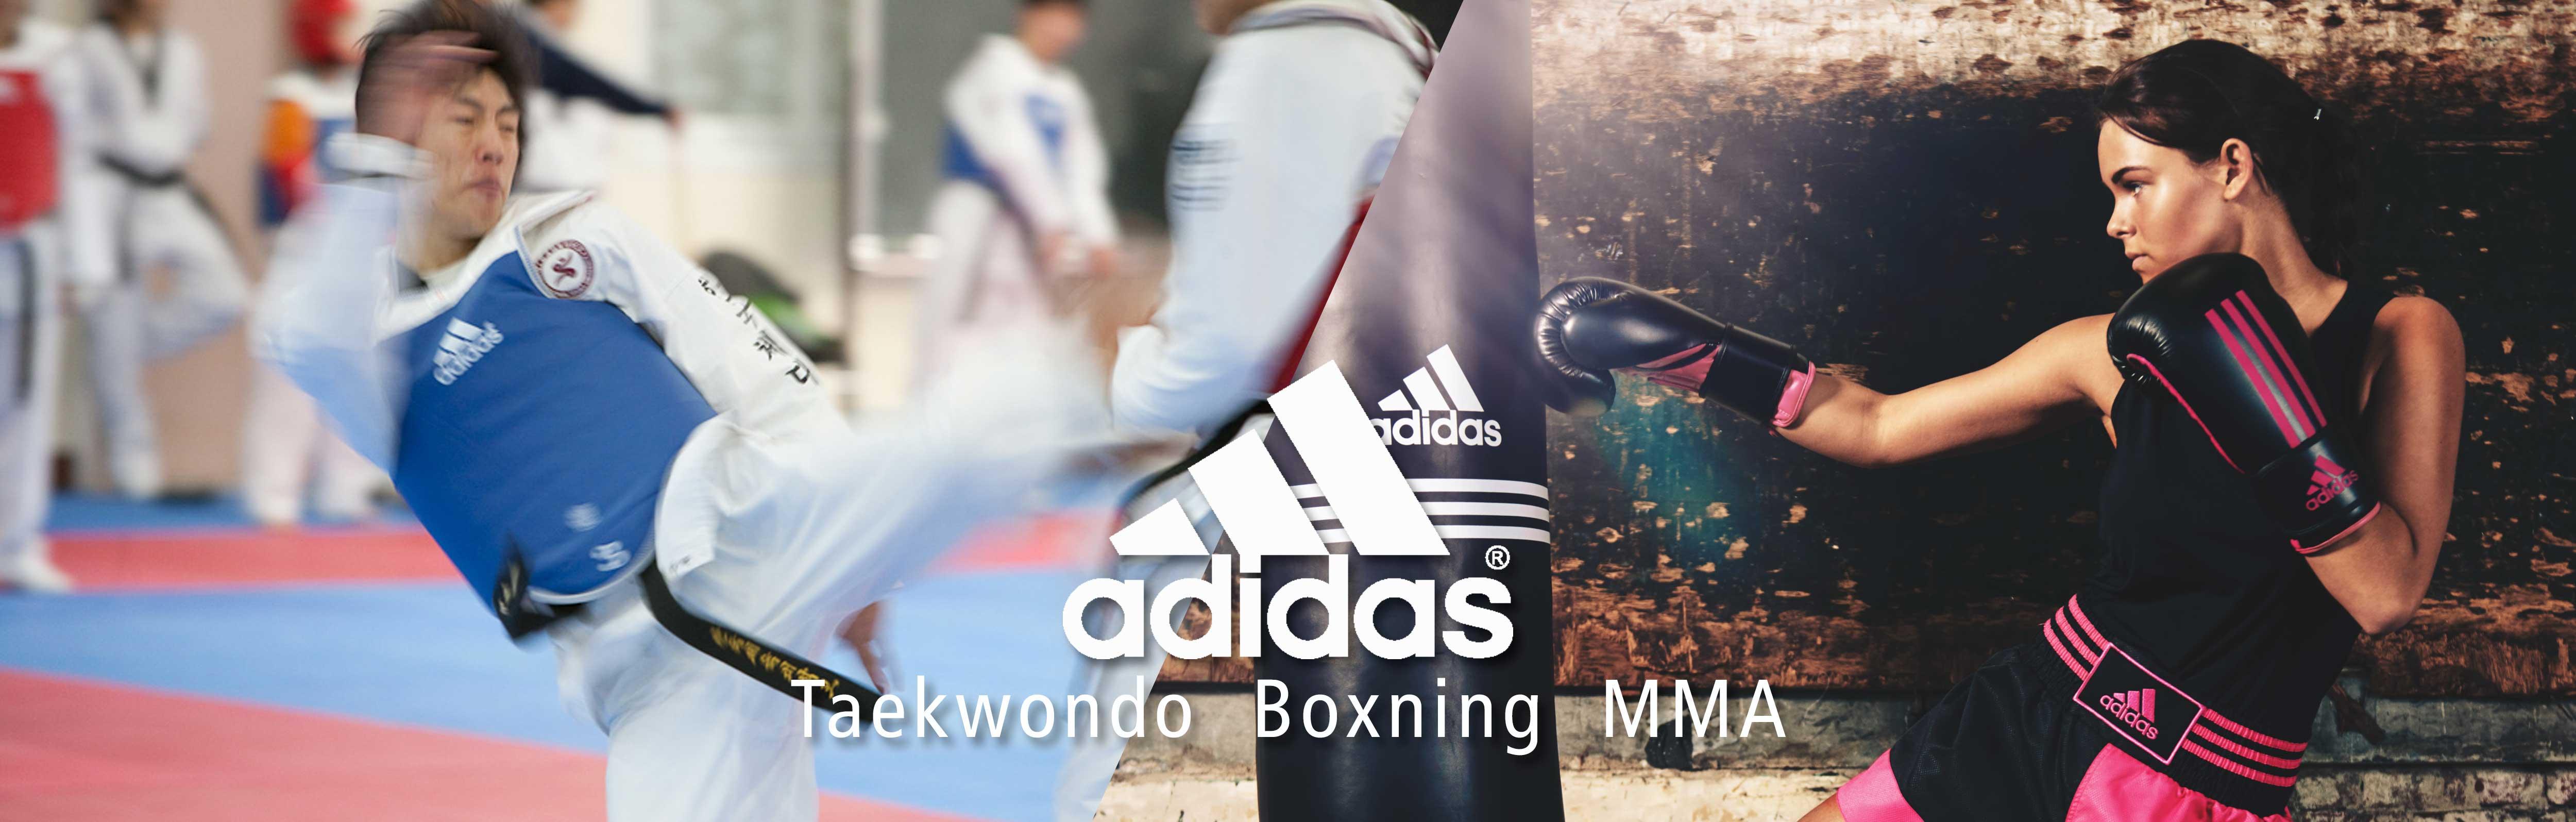 adidas Taekwondo, Boxning och MMA